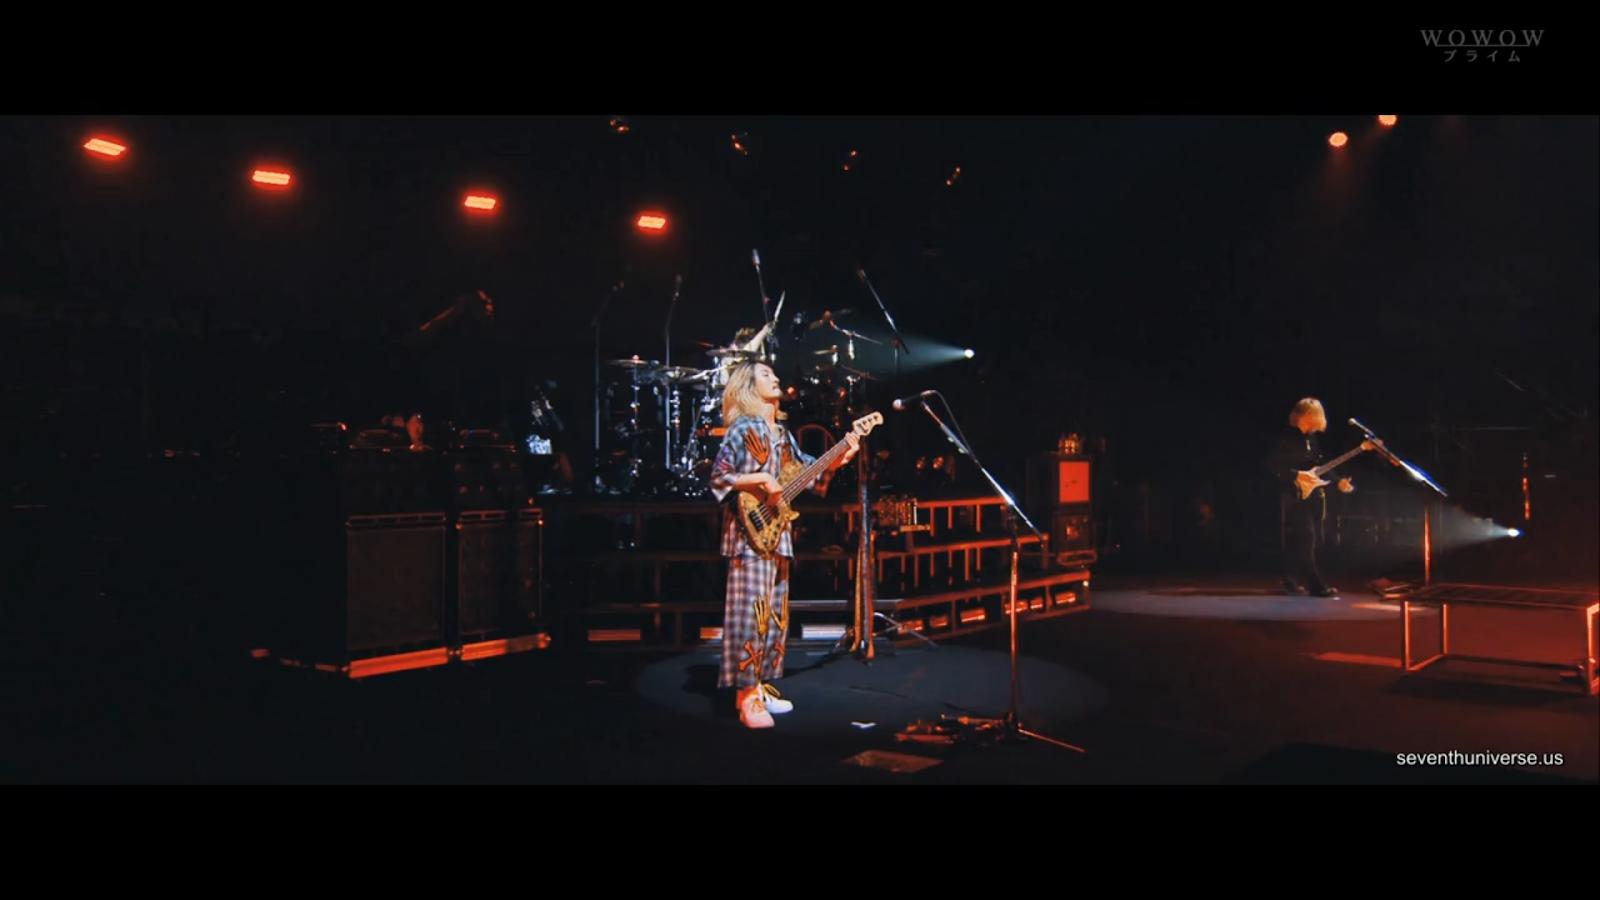 One ok rock nagisaen full concert download